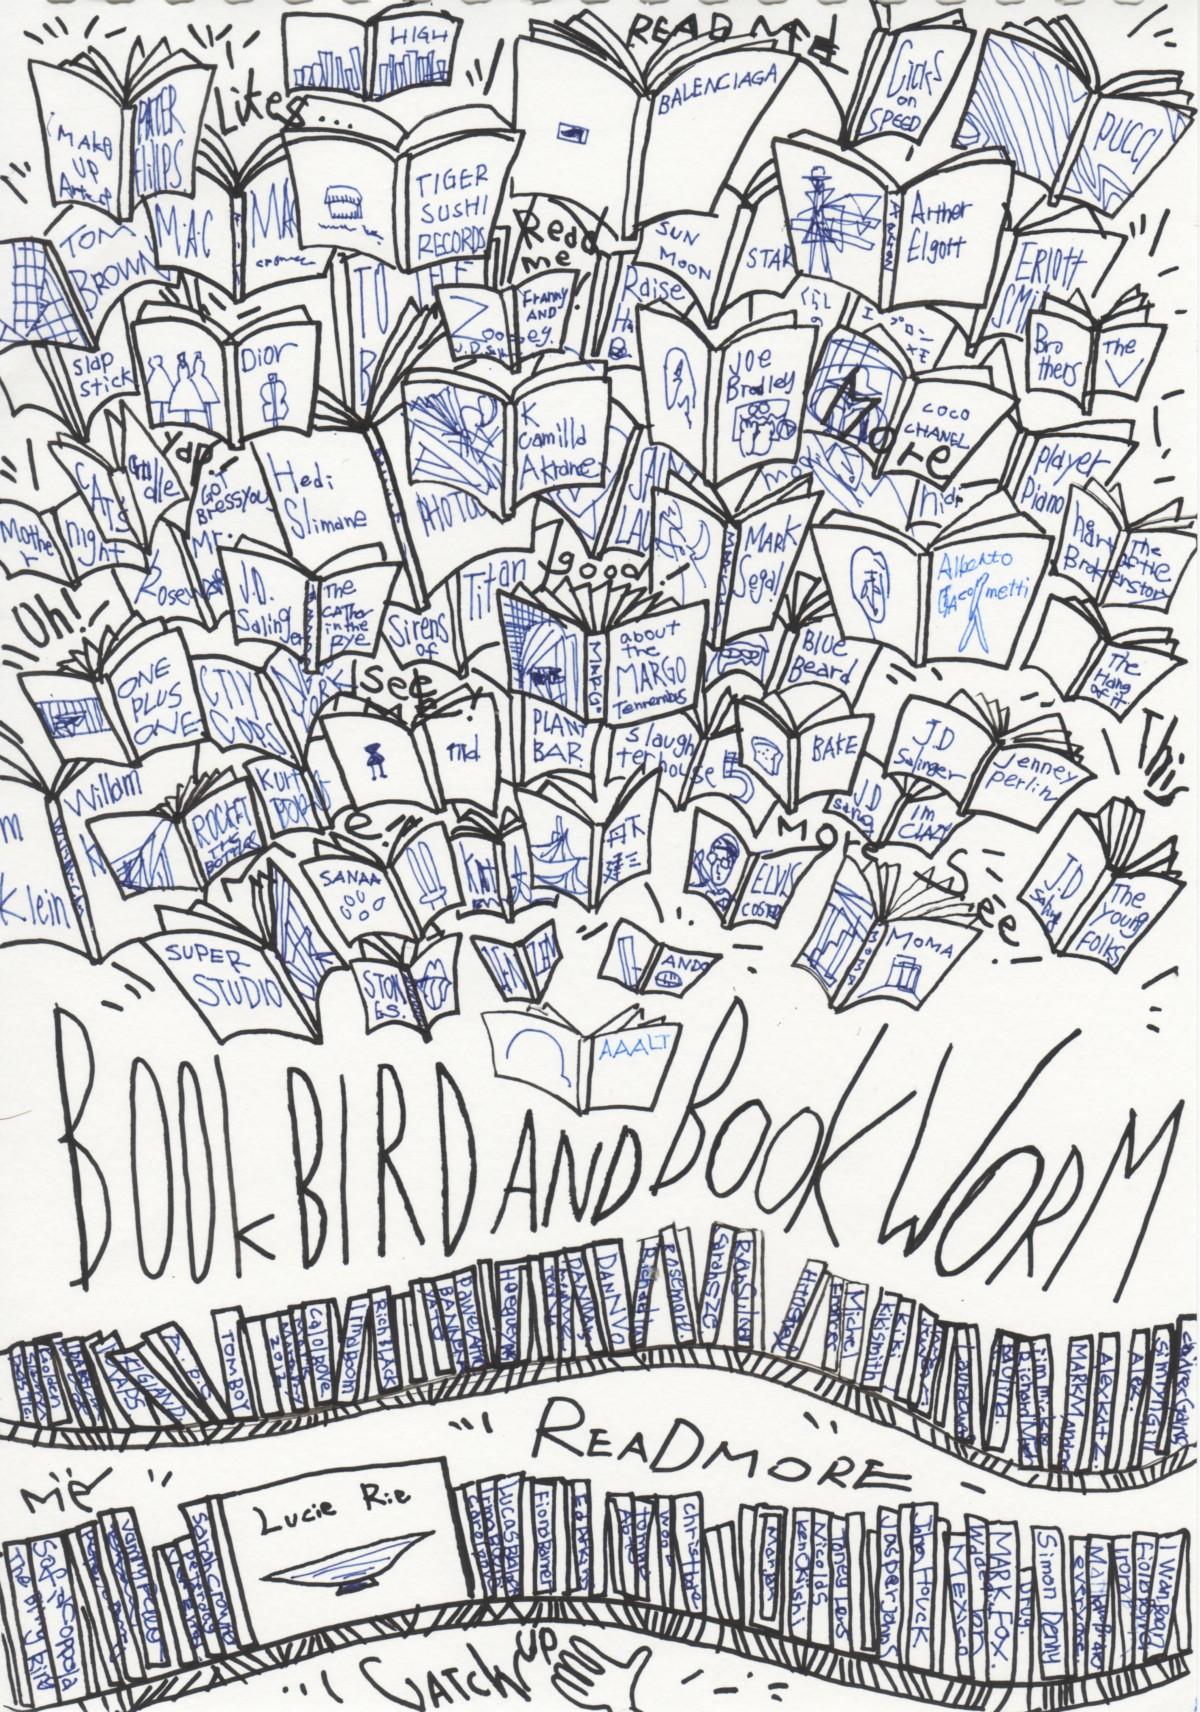 24_book&bookworm